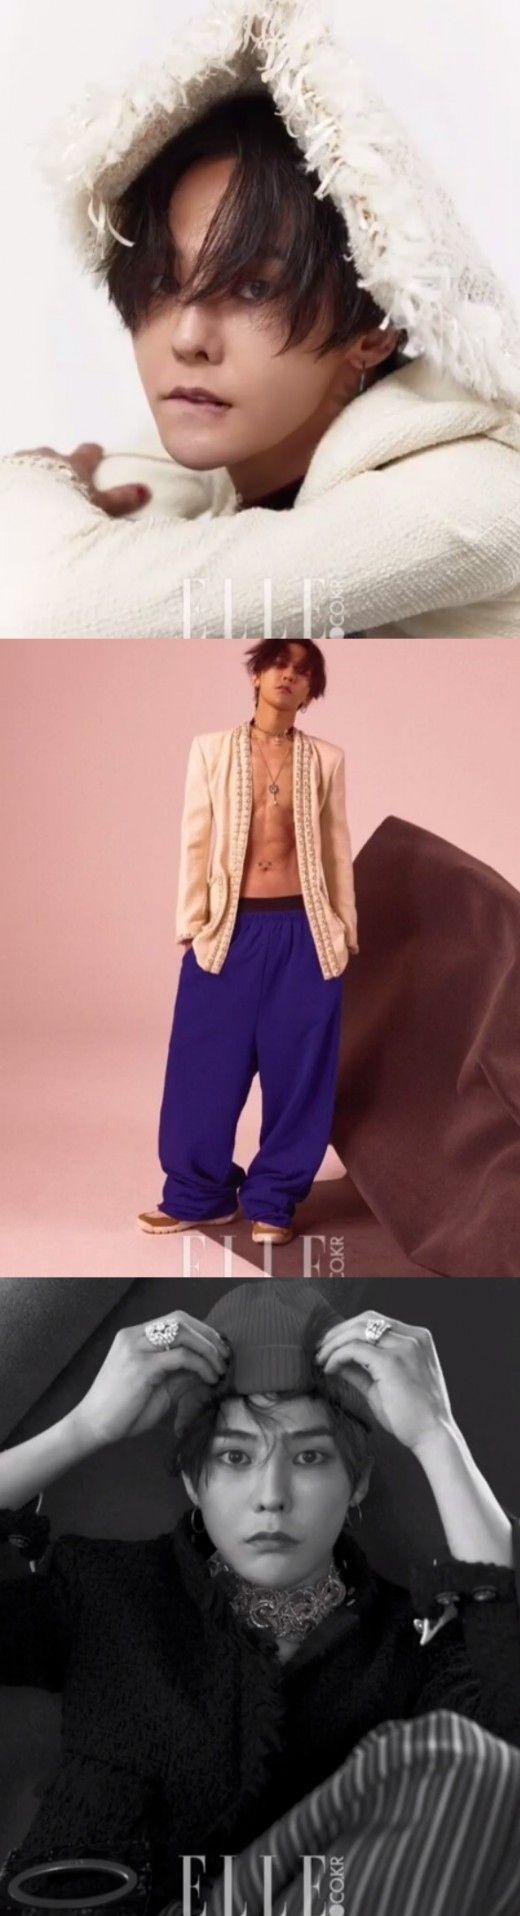 "【BIGBANG NEWS】BIGBANGのG-DRAGON、鍛えられた腹筋に視線釘付け""まるで板チョコ"""